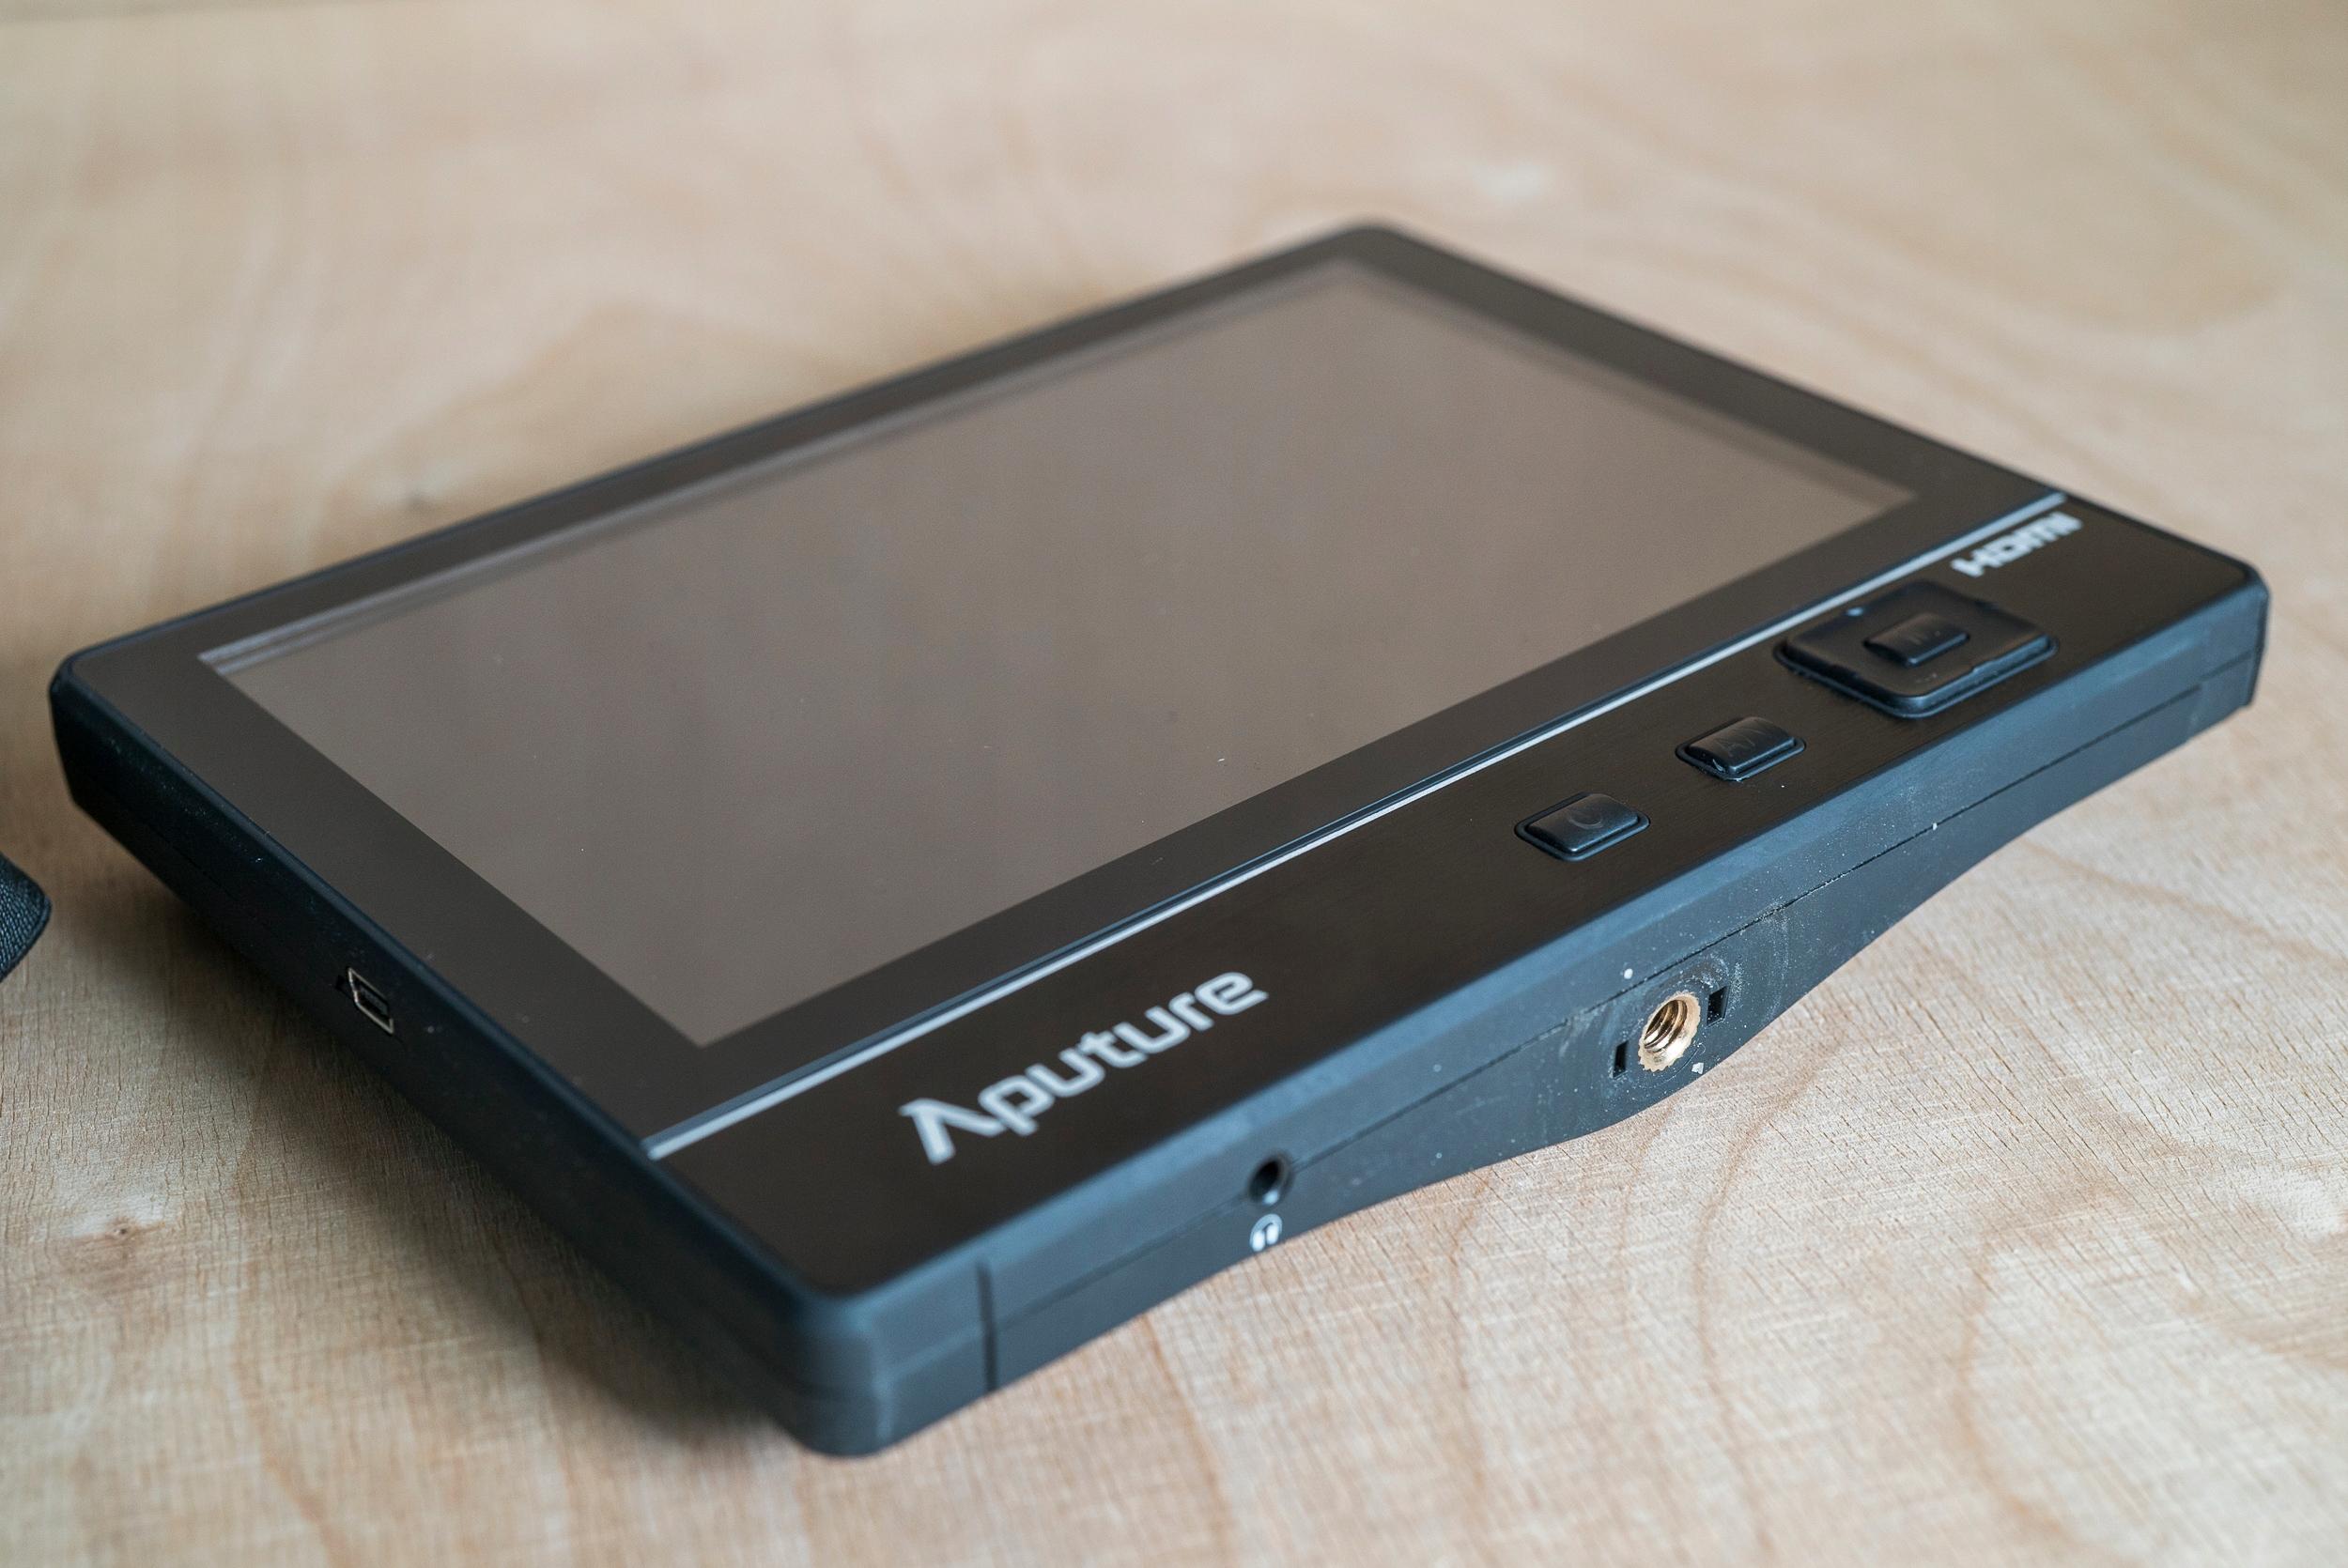 Aputure VS-2 Monitor Podglądowy 7 Cali HDMI